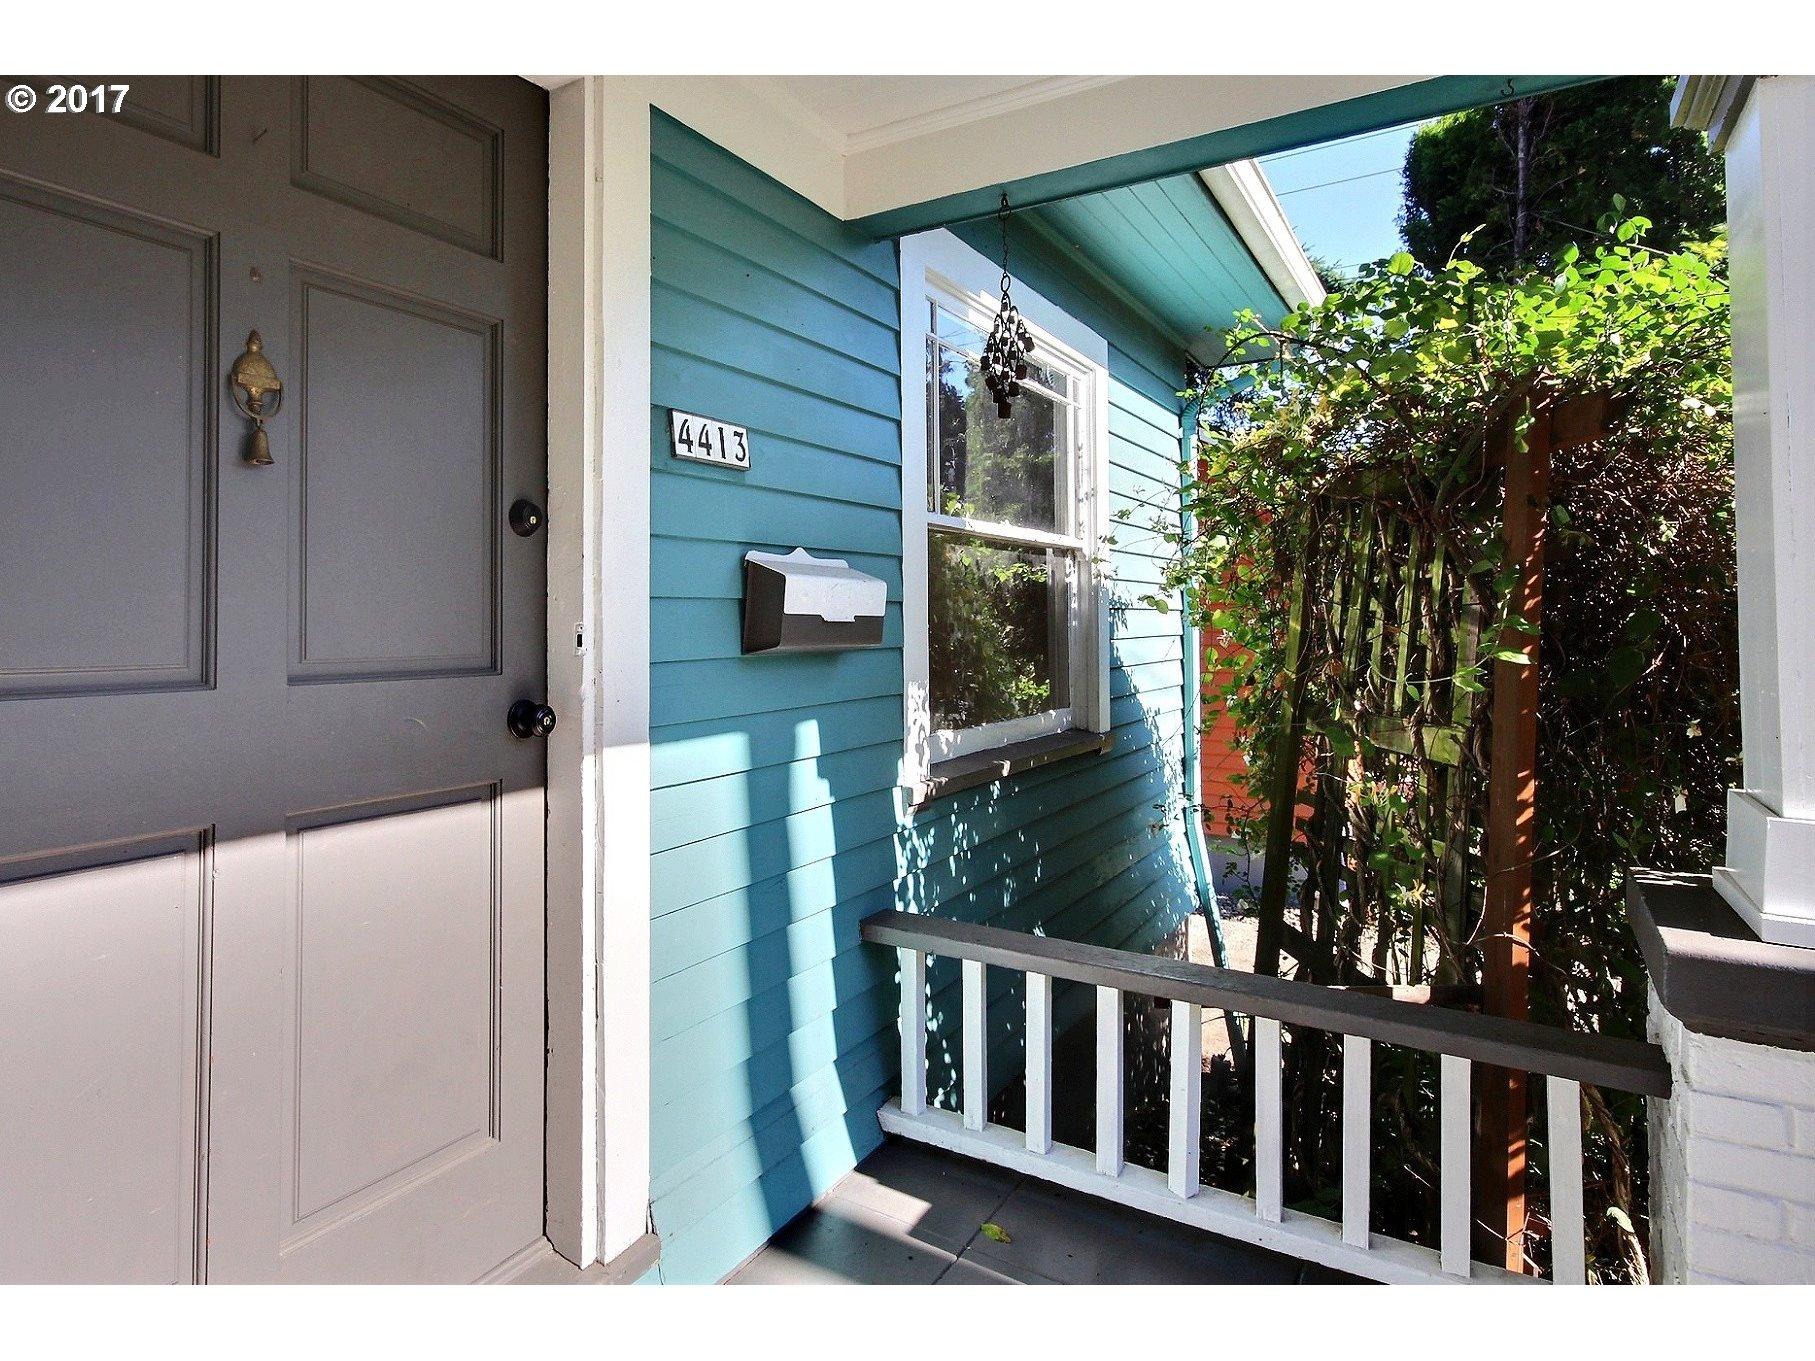 4413 NE 33RD AVE Portland, OR 97211 - MLS #: 17078246